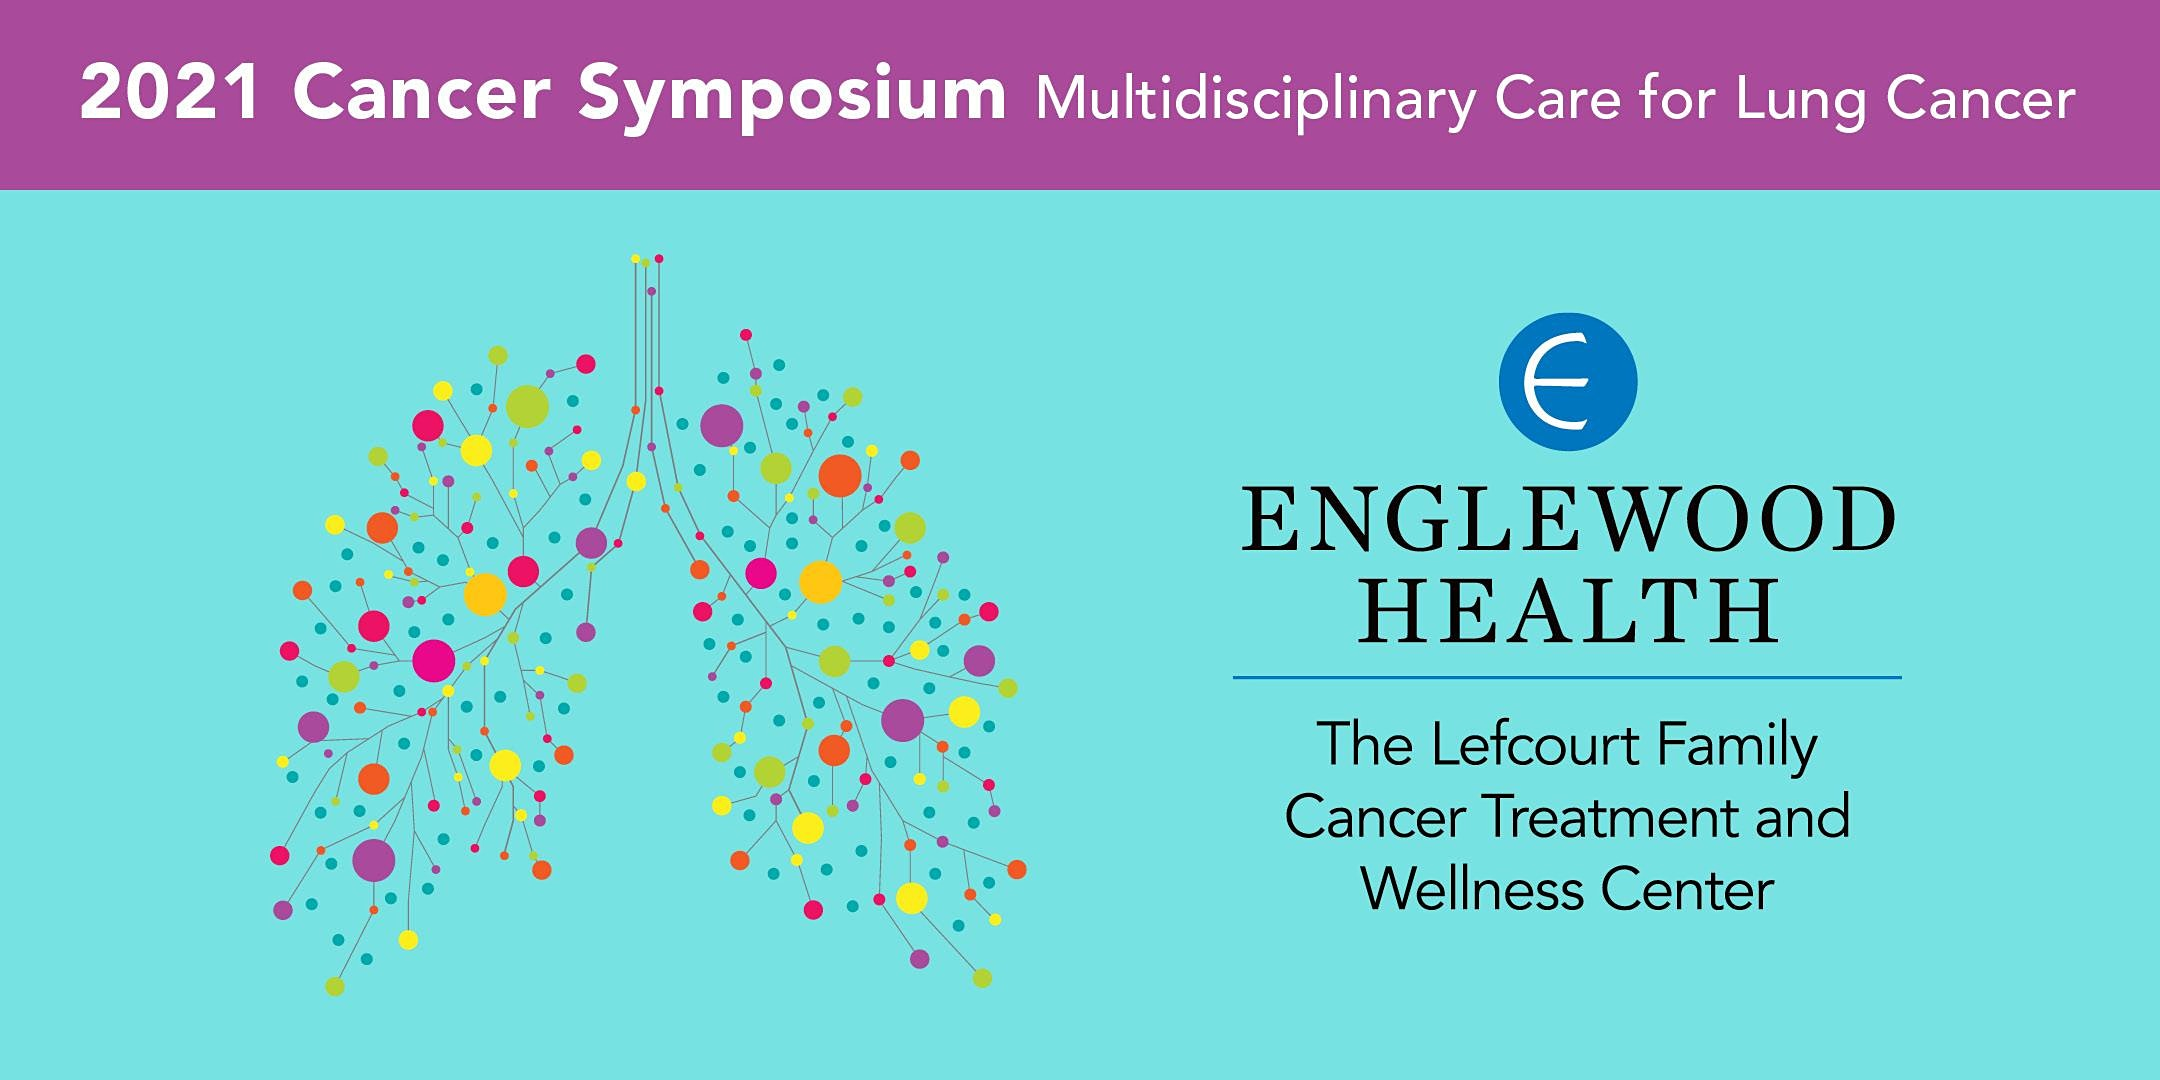 2021 Cancer Symposium: Multidisciplinary Care for Lung Cancer